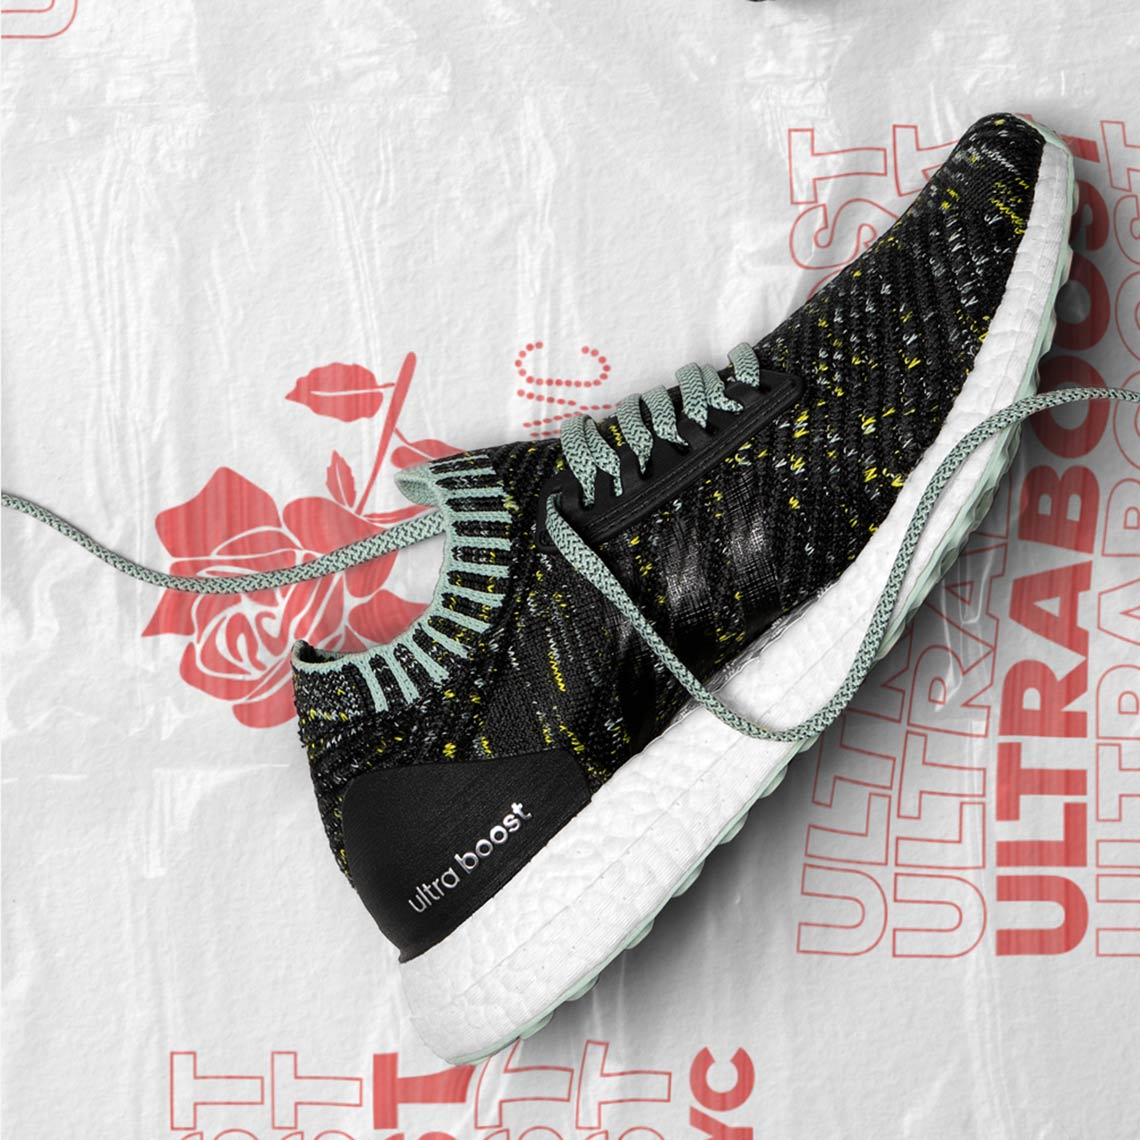 35dcd4b85 adidas Ultra Boost + Ultra Boost X NYC Bodega